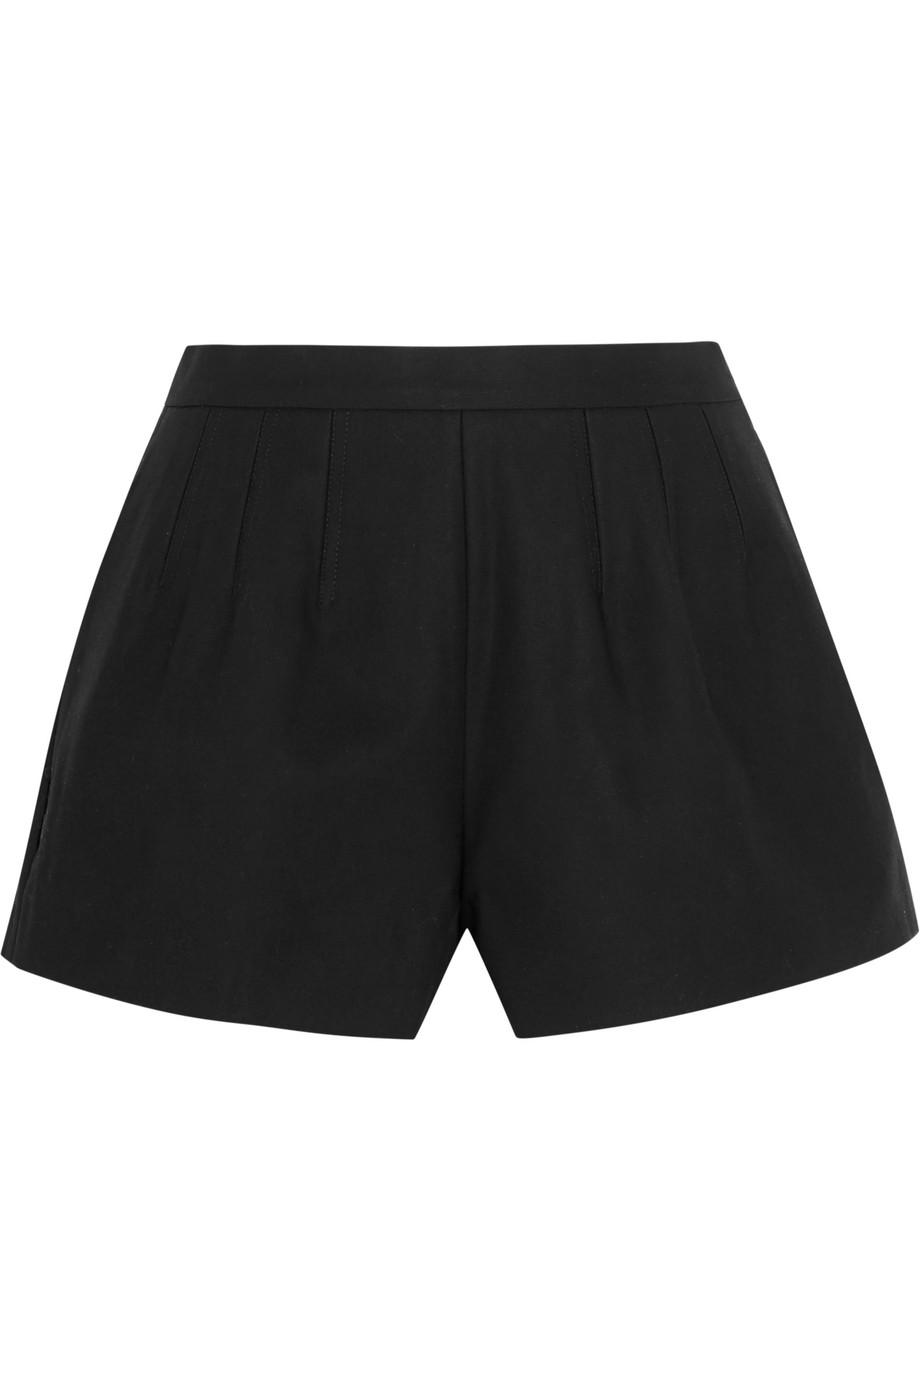 Redvalentino Cotton-Blend Canvas Shorts, Black, Women's, Size: 46